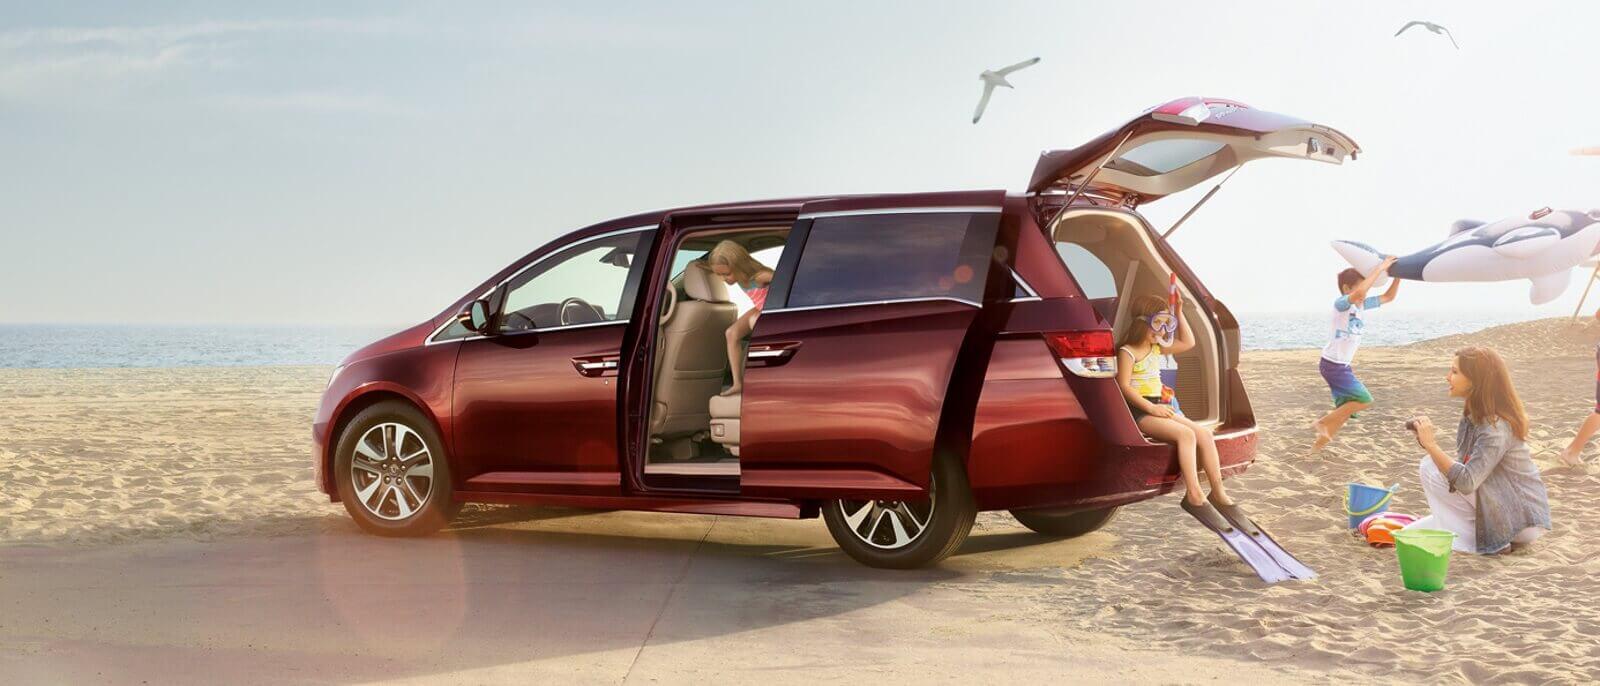 2016 Honda Odyssey beach scene